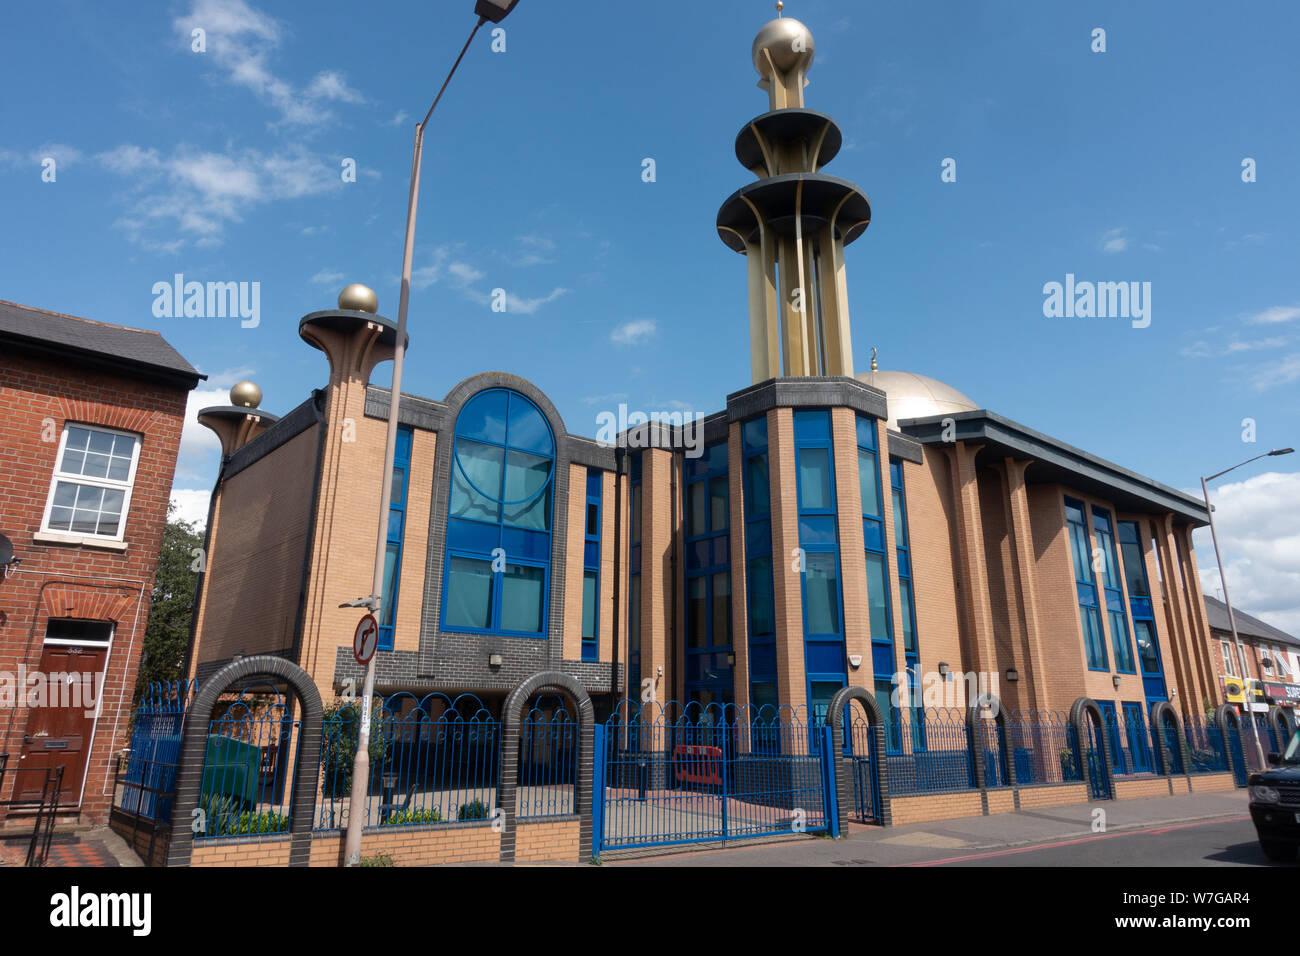 Abu Bakr Stock Photos & Abu Bakr Stock Images - Alamy